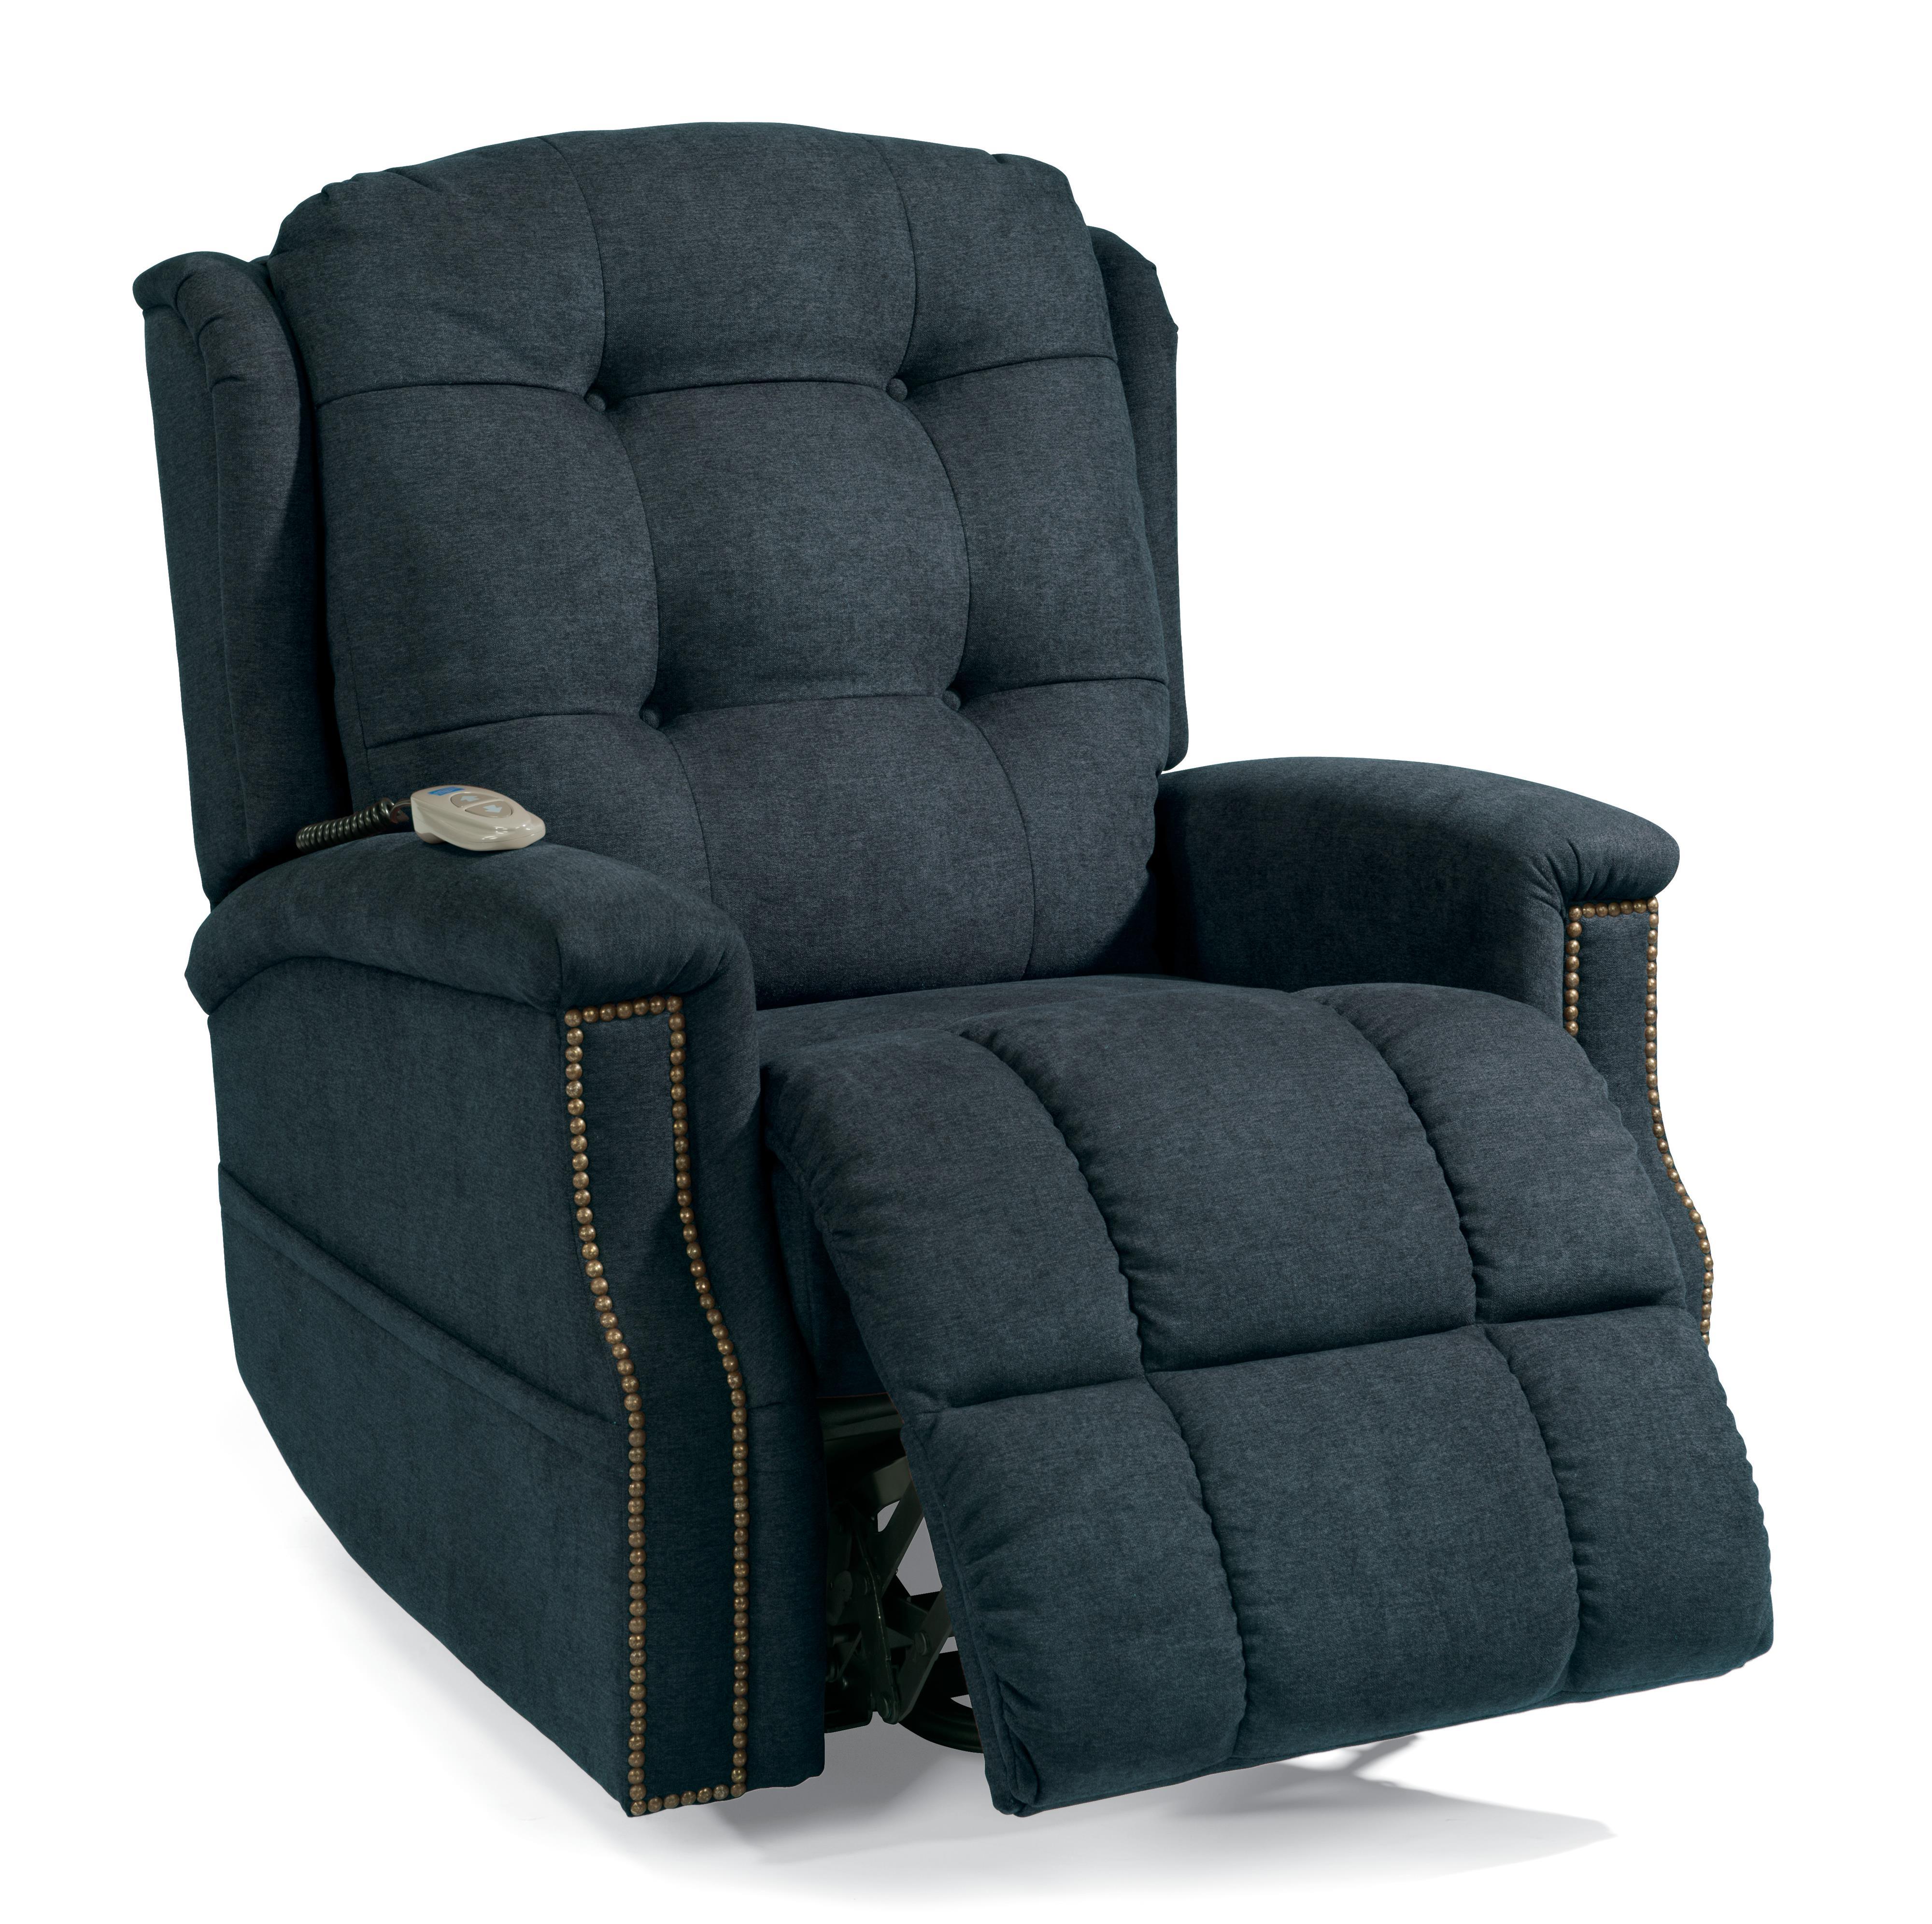 Flexsteel Latitudes Lift Chairs Alexander Lift Recliner - Item Number: 1901-55-414-42